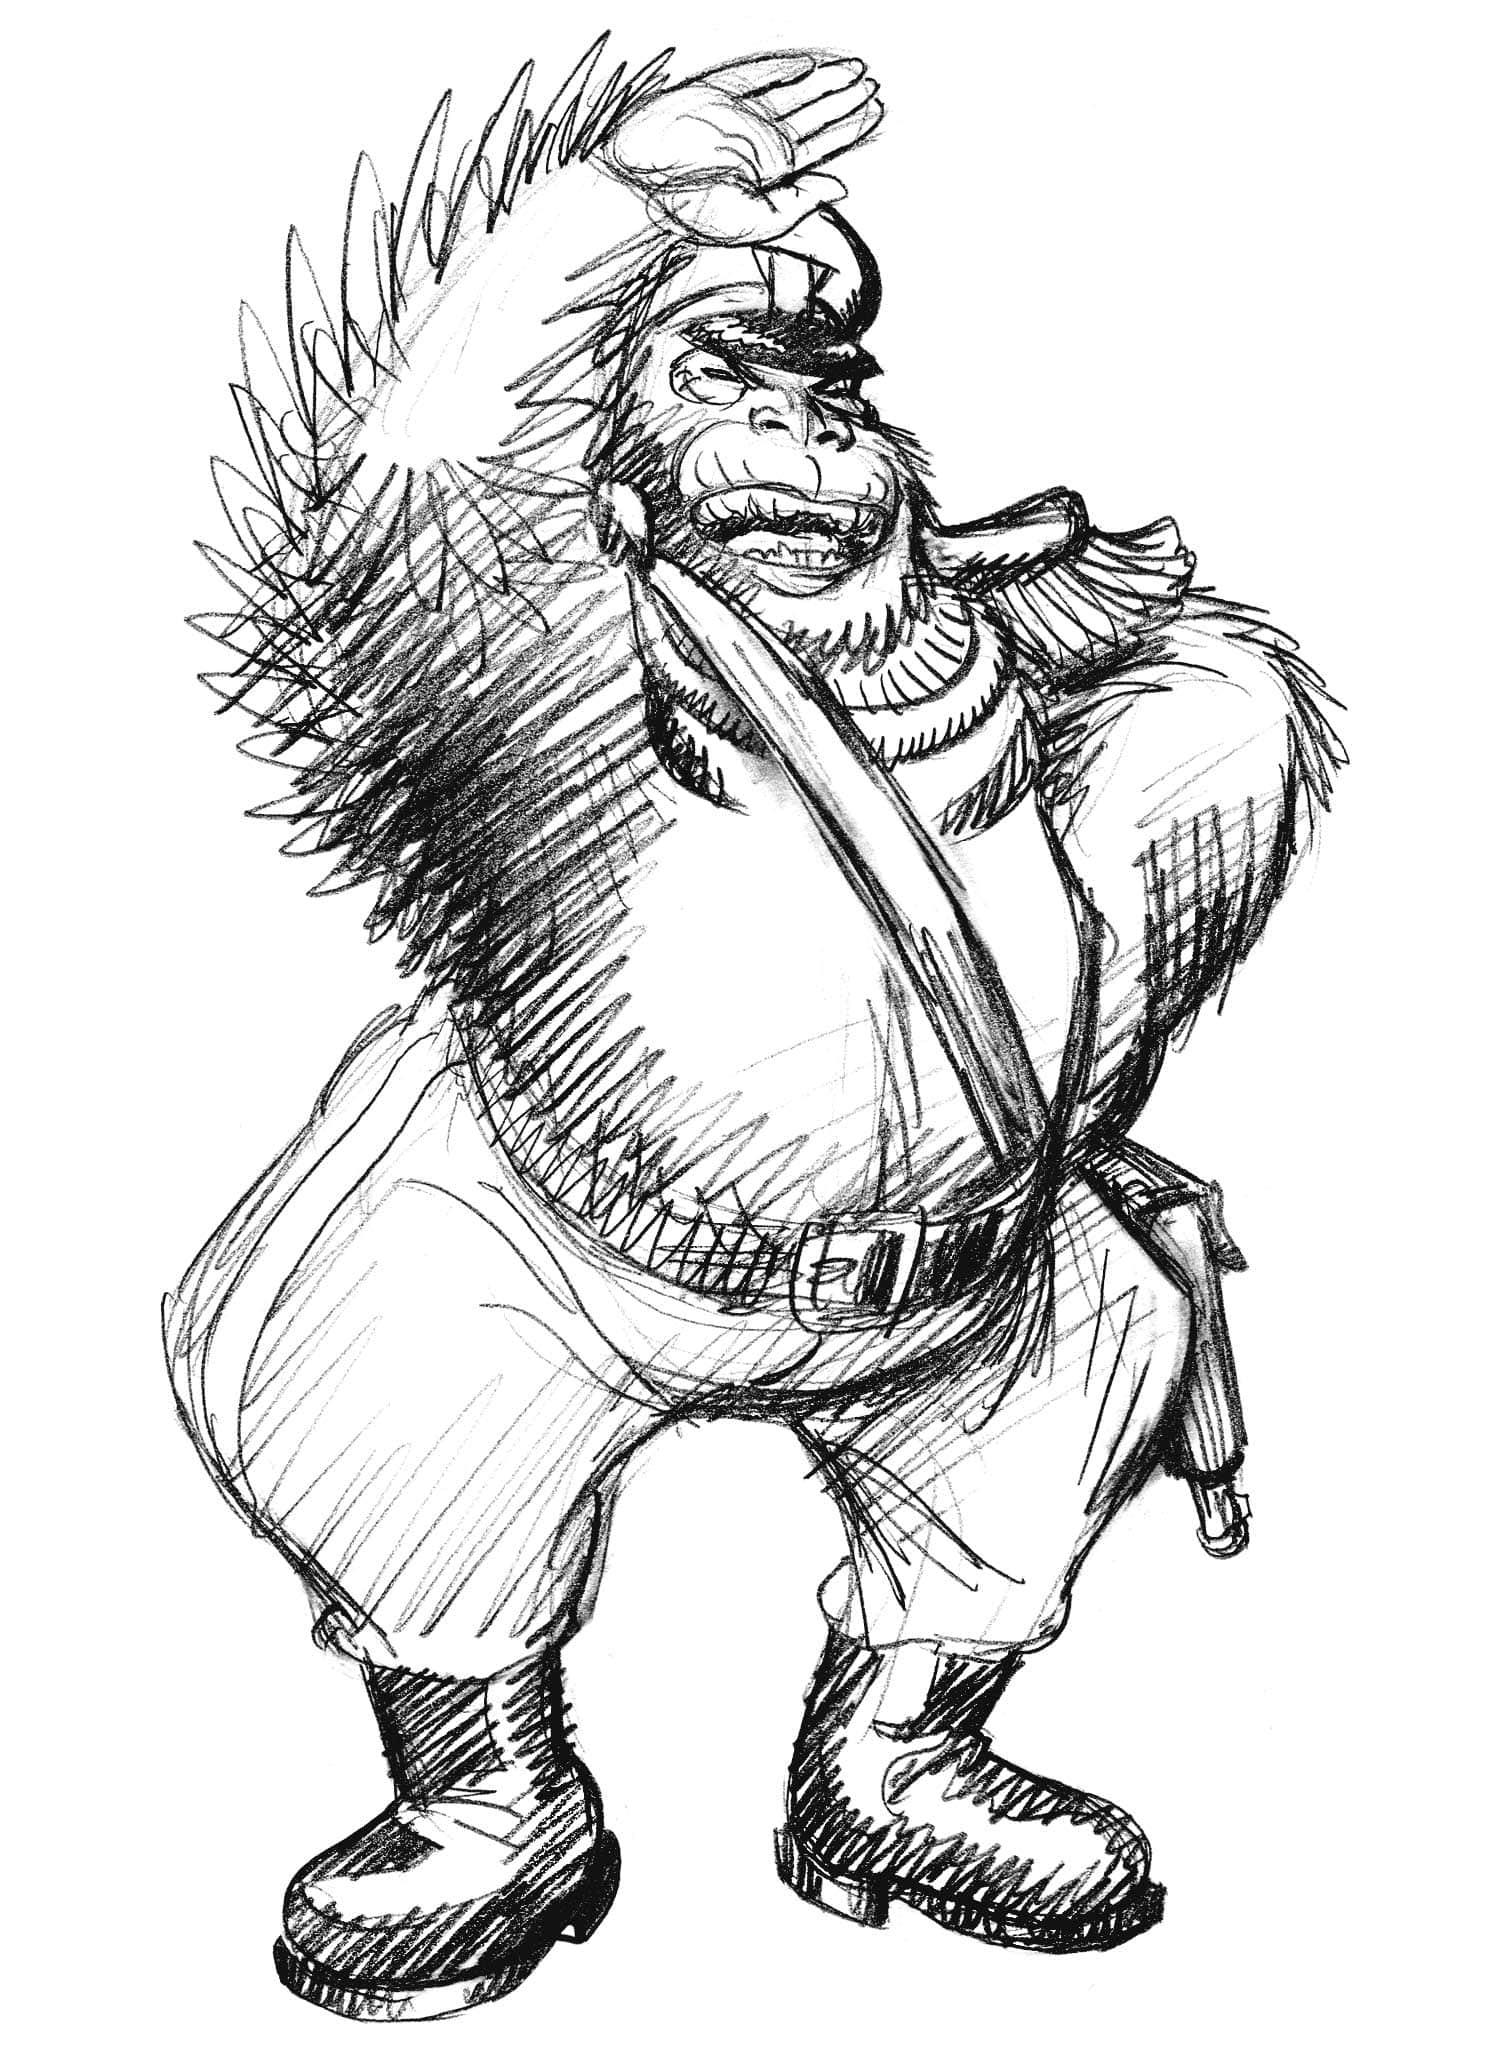 KH2900D-battle-monkeys-general-gorilla